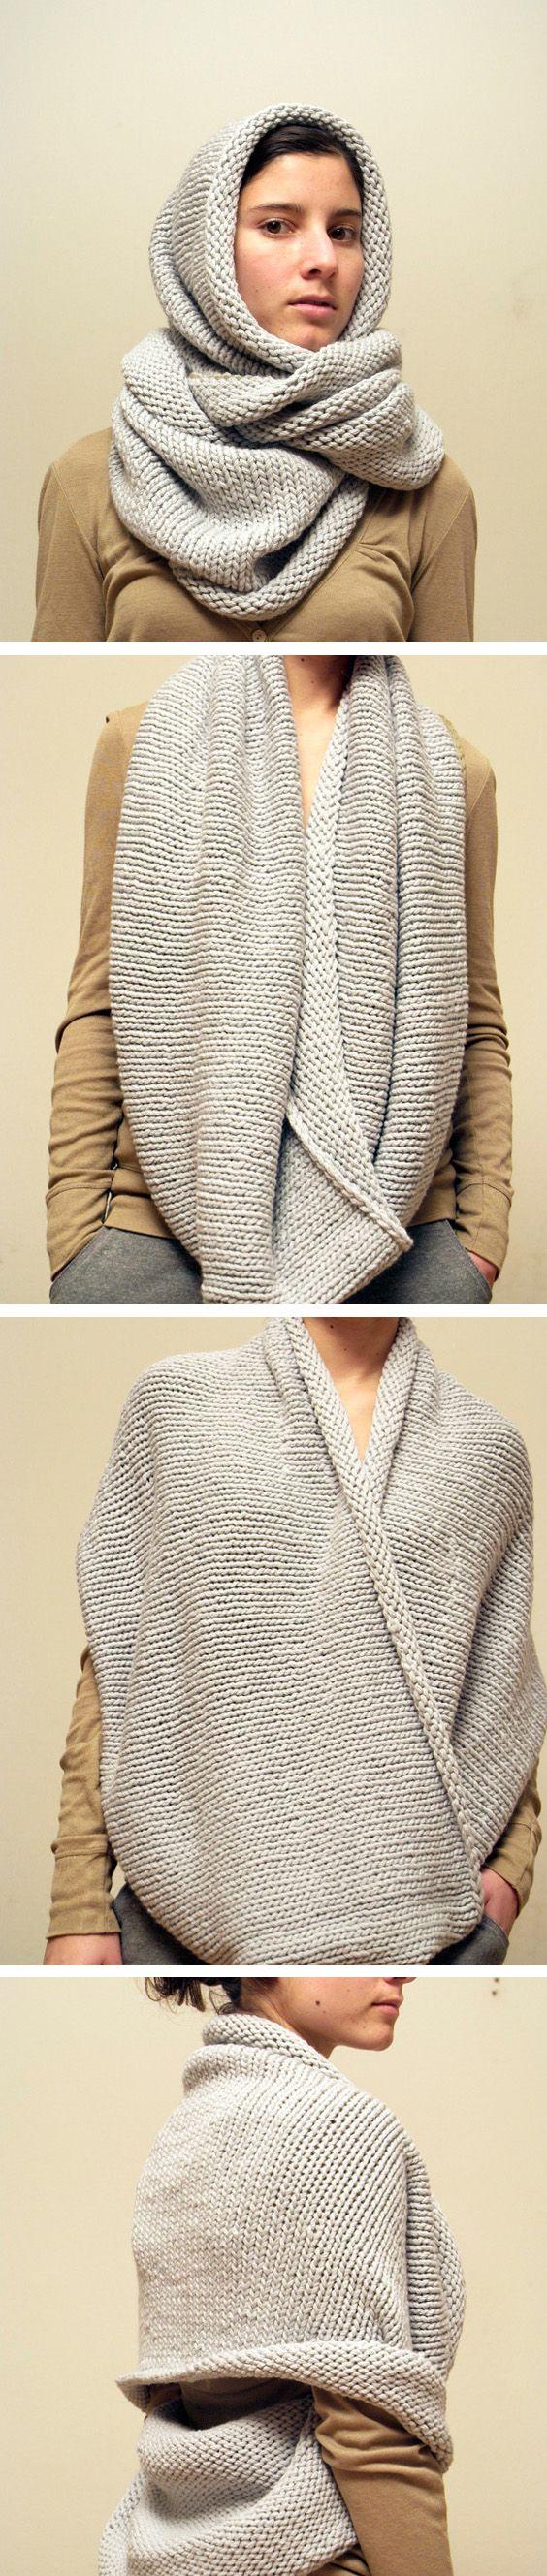 Elementum by Daniela Pais...brilliant, simple design | Oma Lotti ...